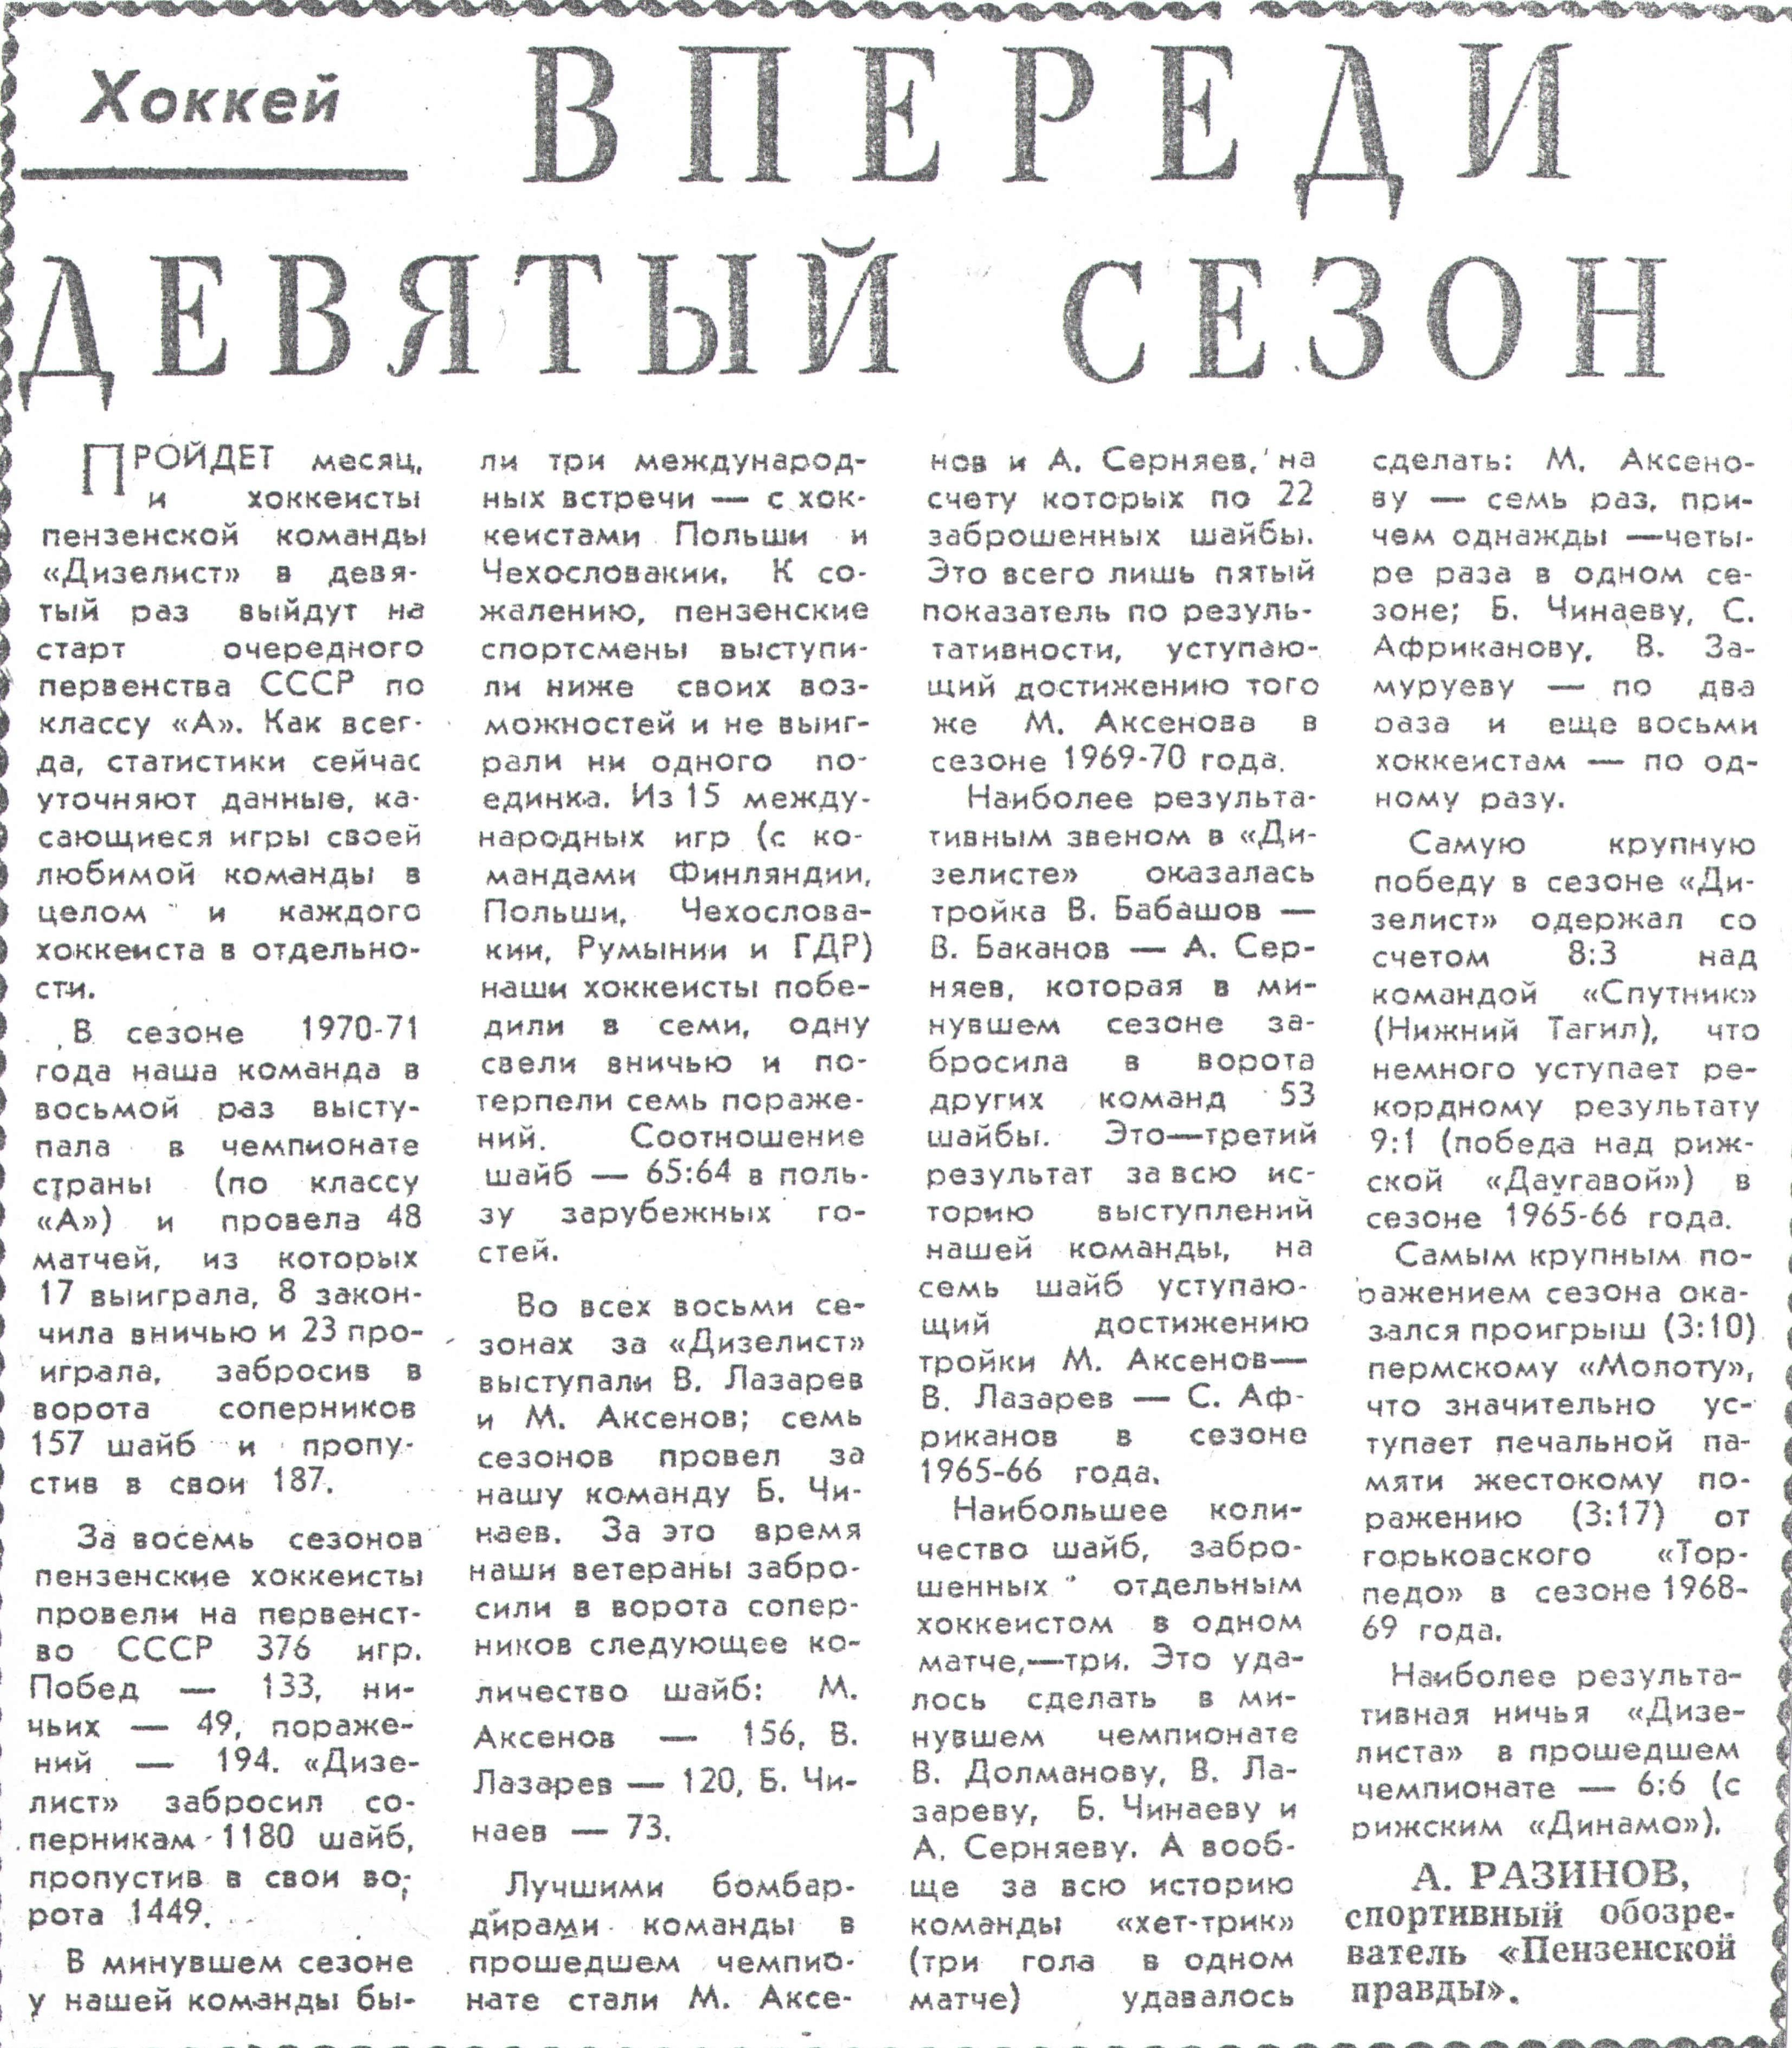 1970-71 итоги.jpg